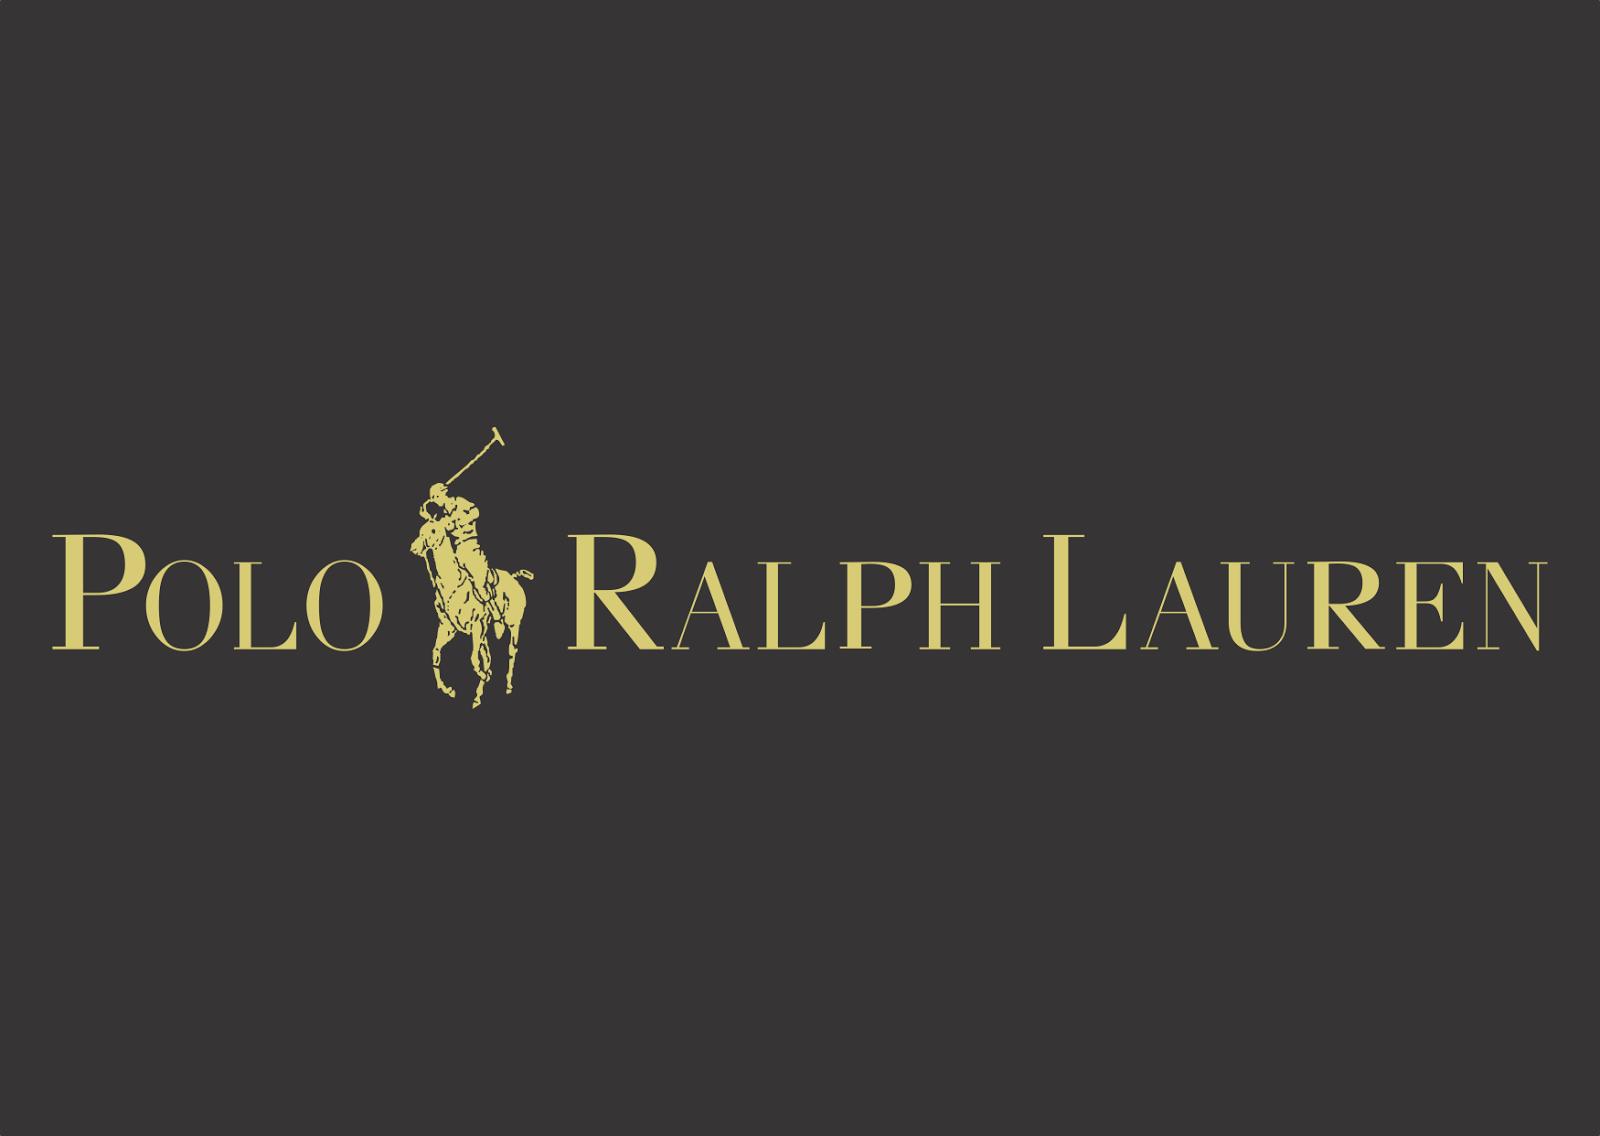 big sale b1873 087bc Polo Ralph Lauren Logo Wallpapers - Wallpaper Cave